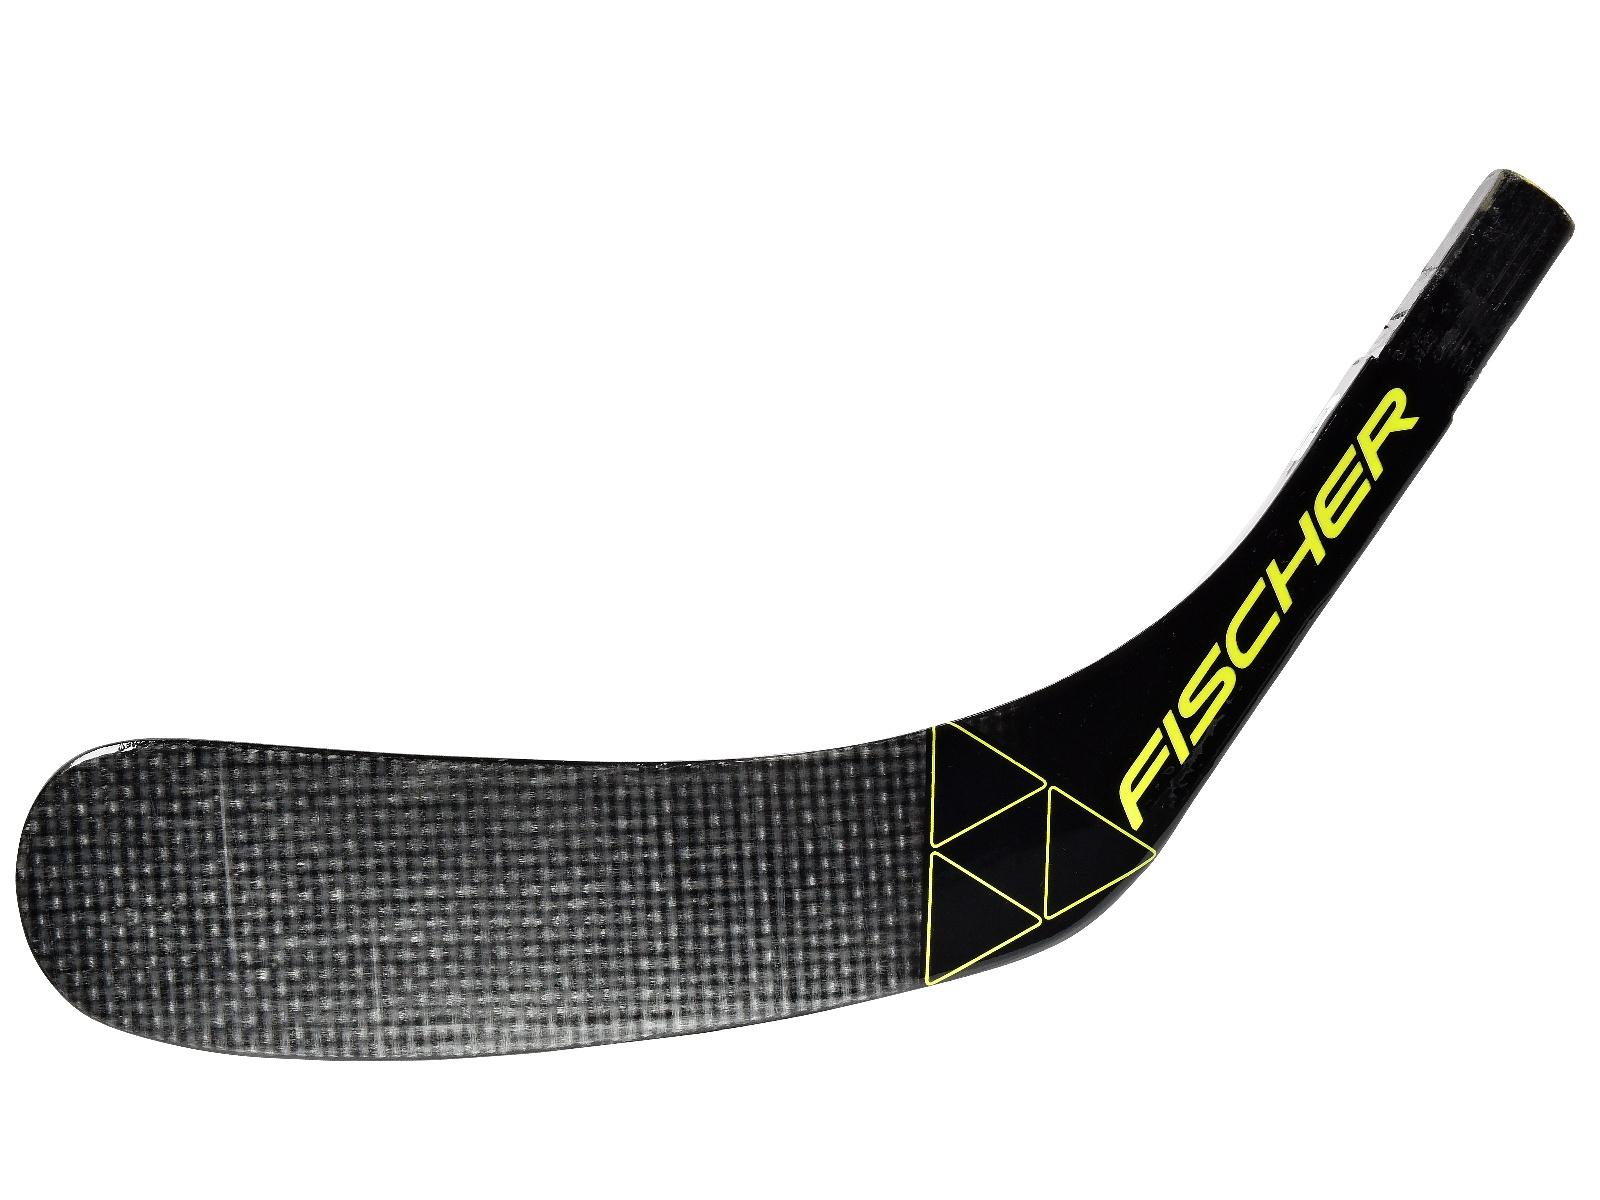 Hokejová čepel FISCHER W300 Senior - LH 23